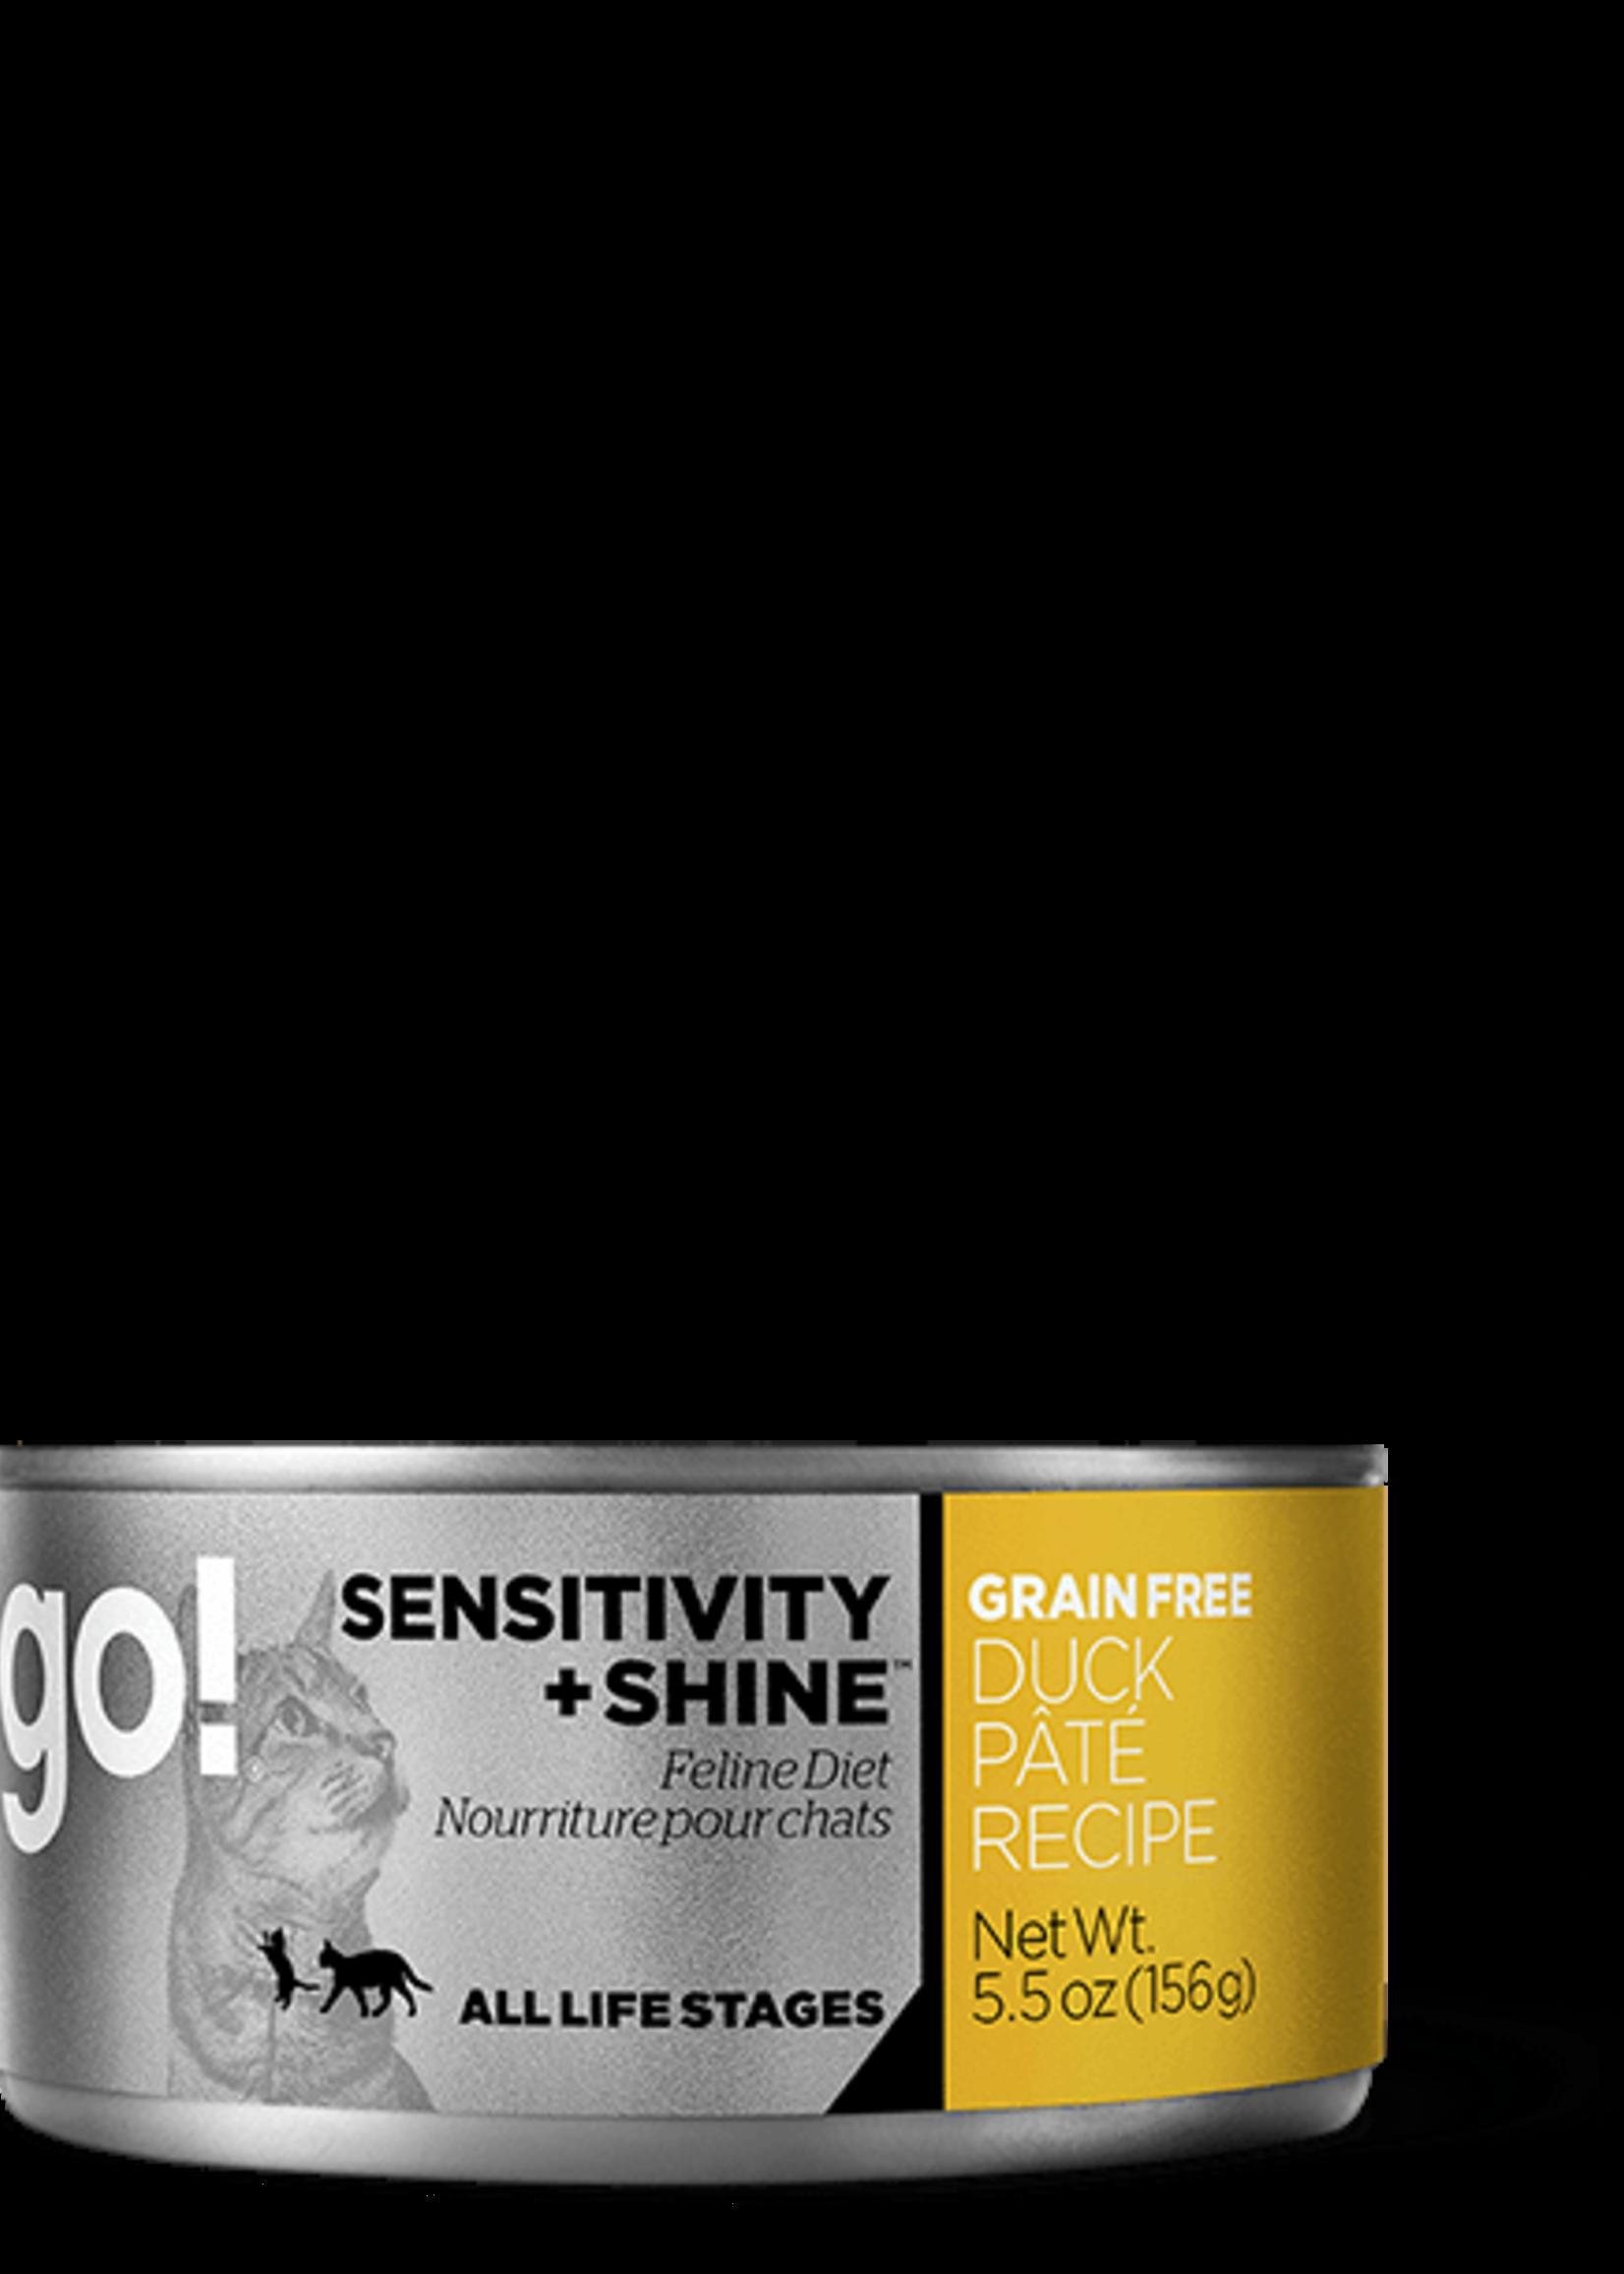 Petcurean Go Sensitivity + Shine Cat Duck Pate Can 5.5oz.